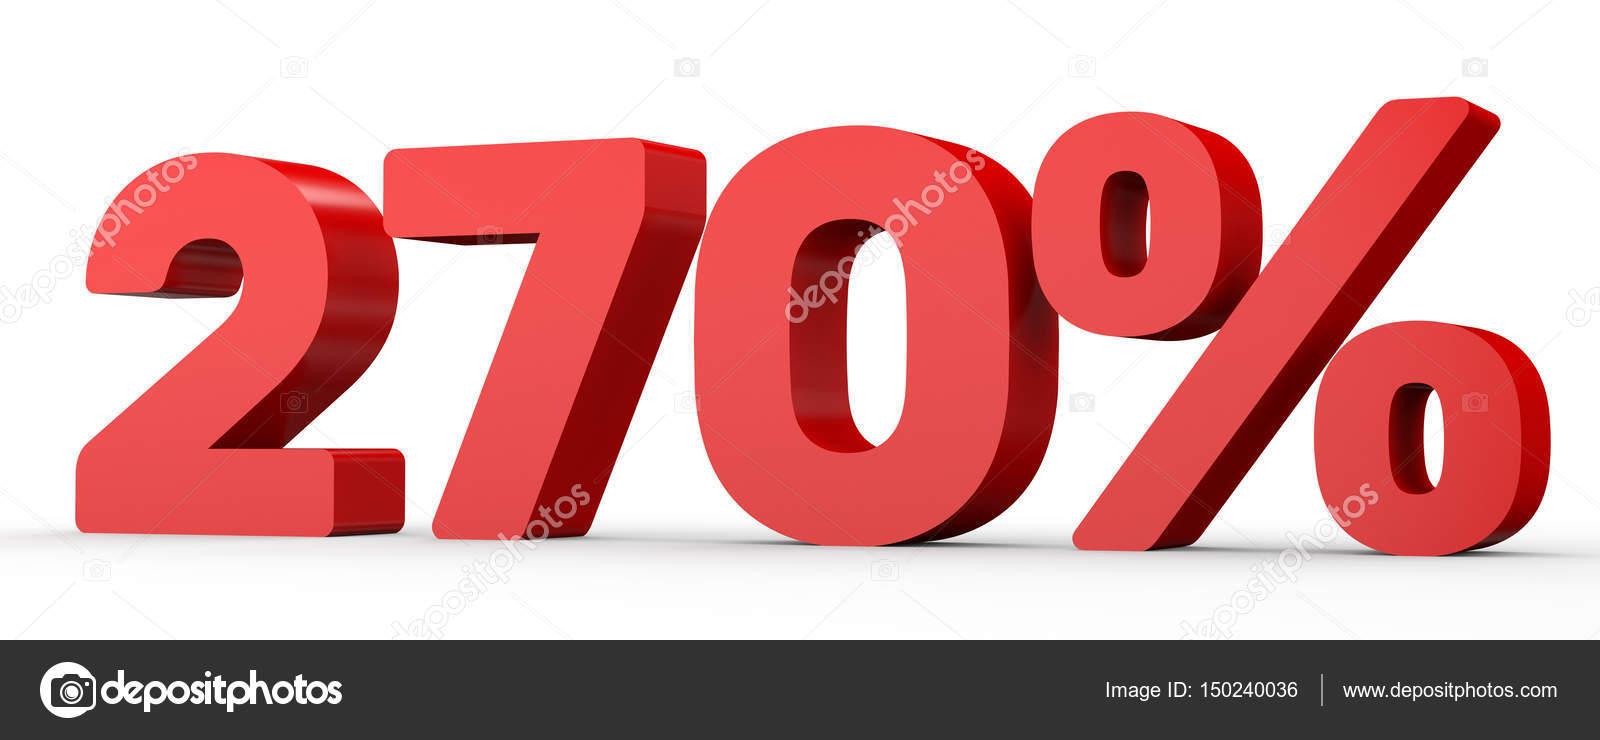 veinte por ciento tronic descargar google